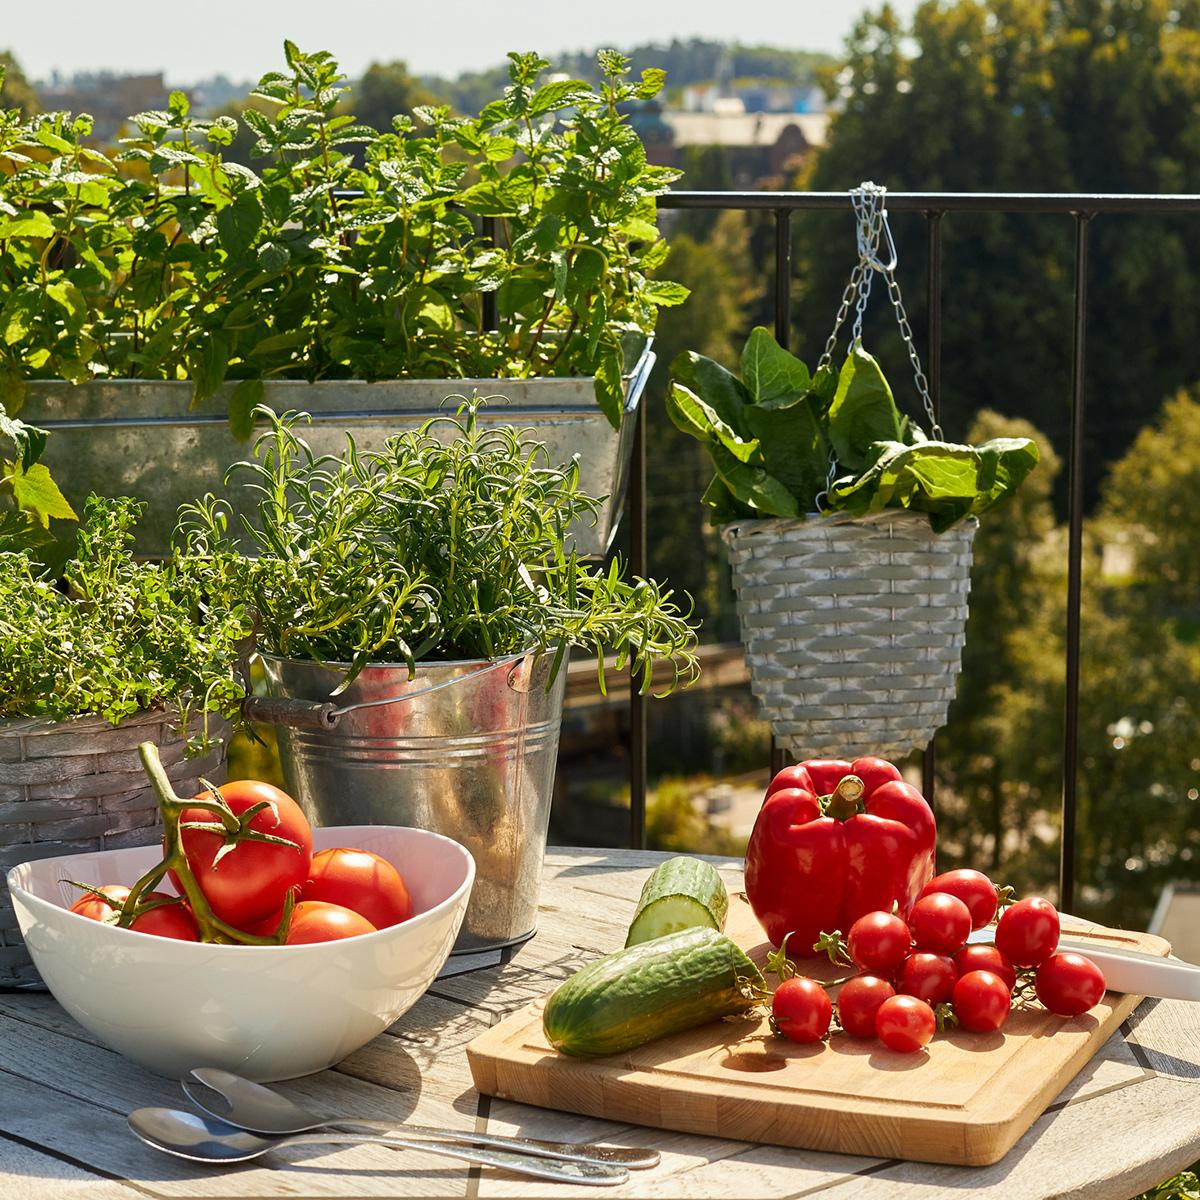 Live shopping for plants: A new venture for Blomsterlandet